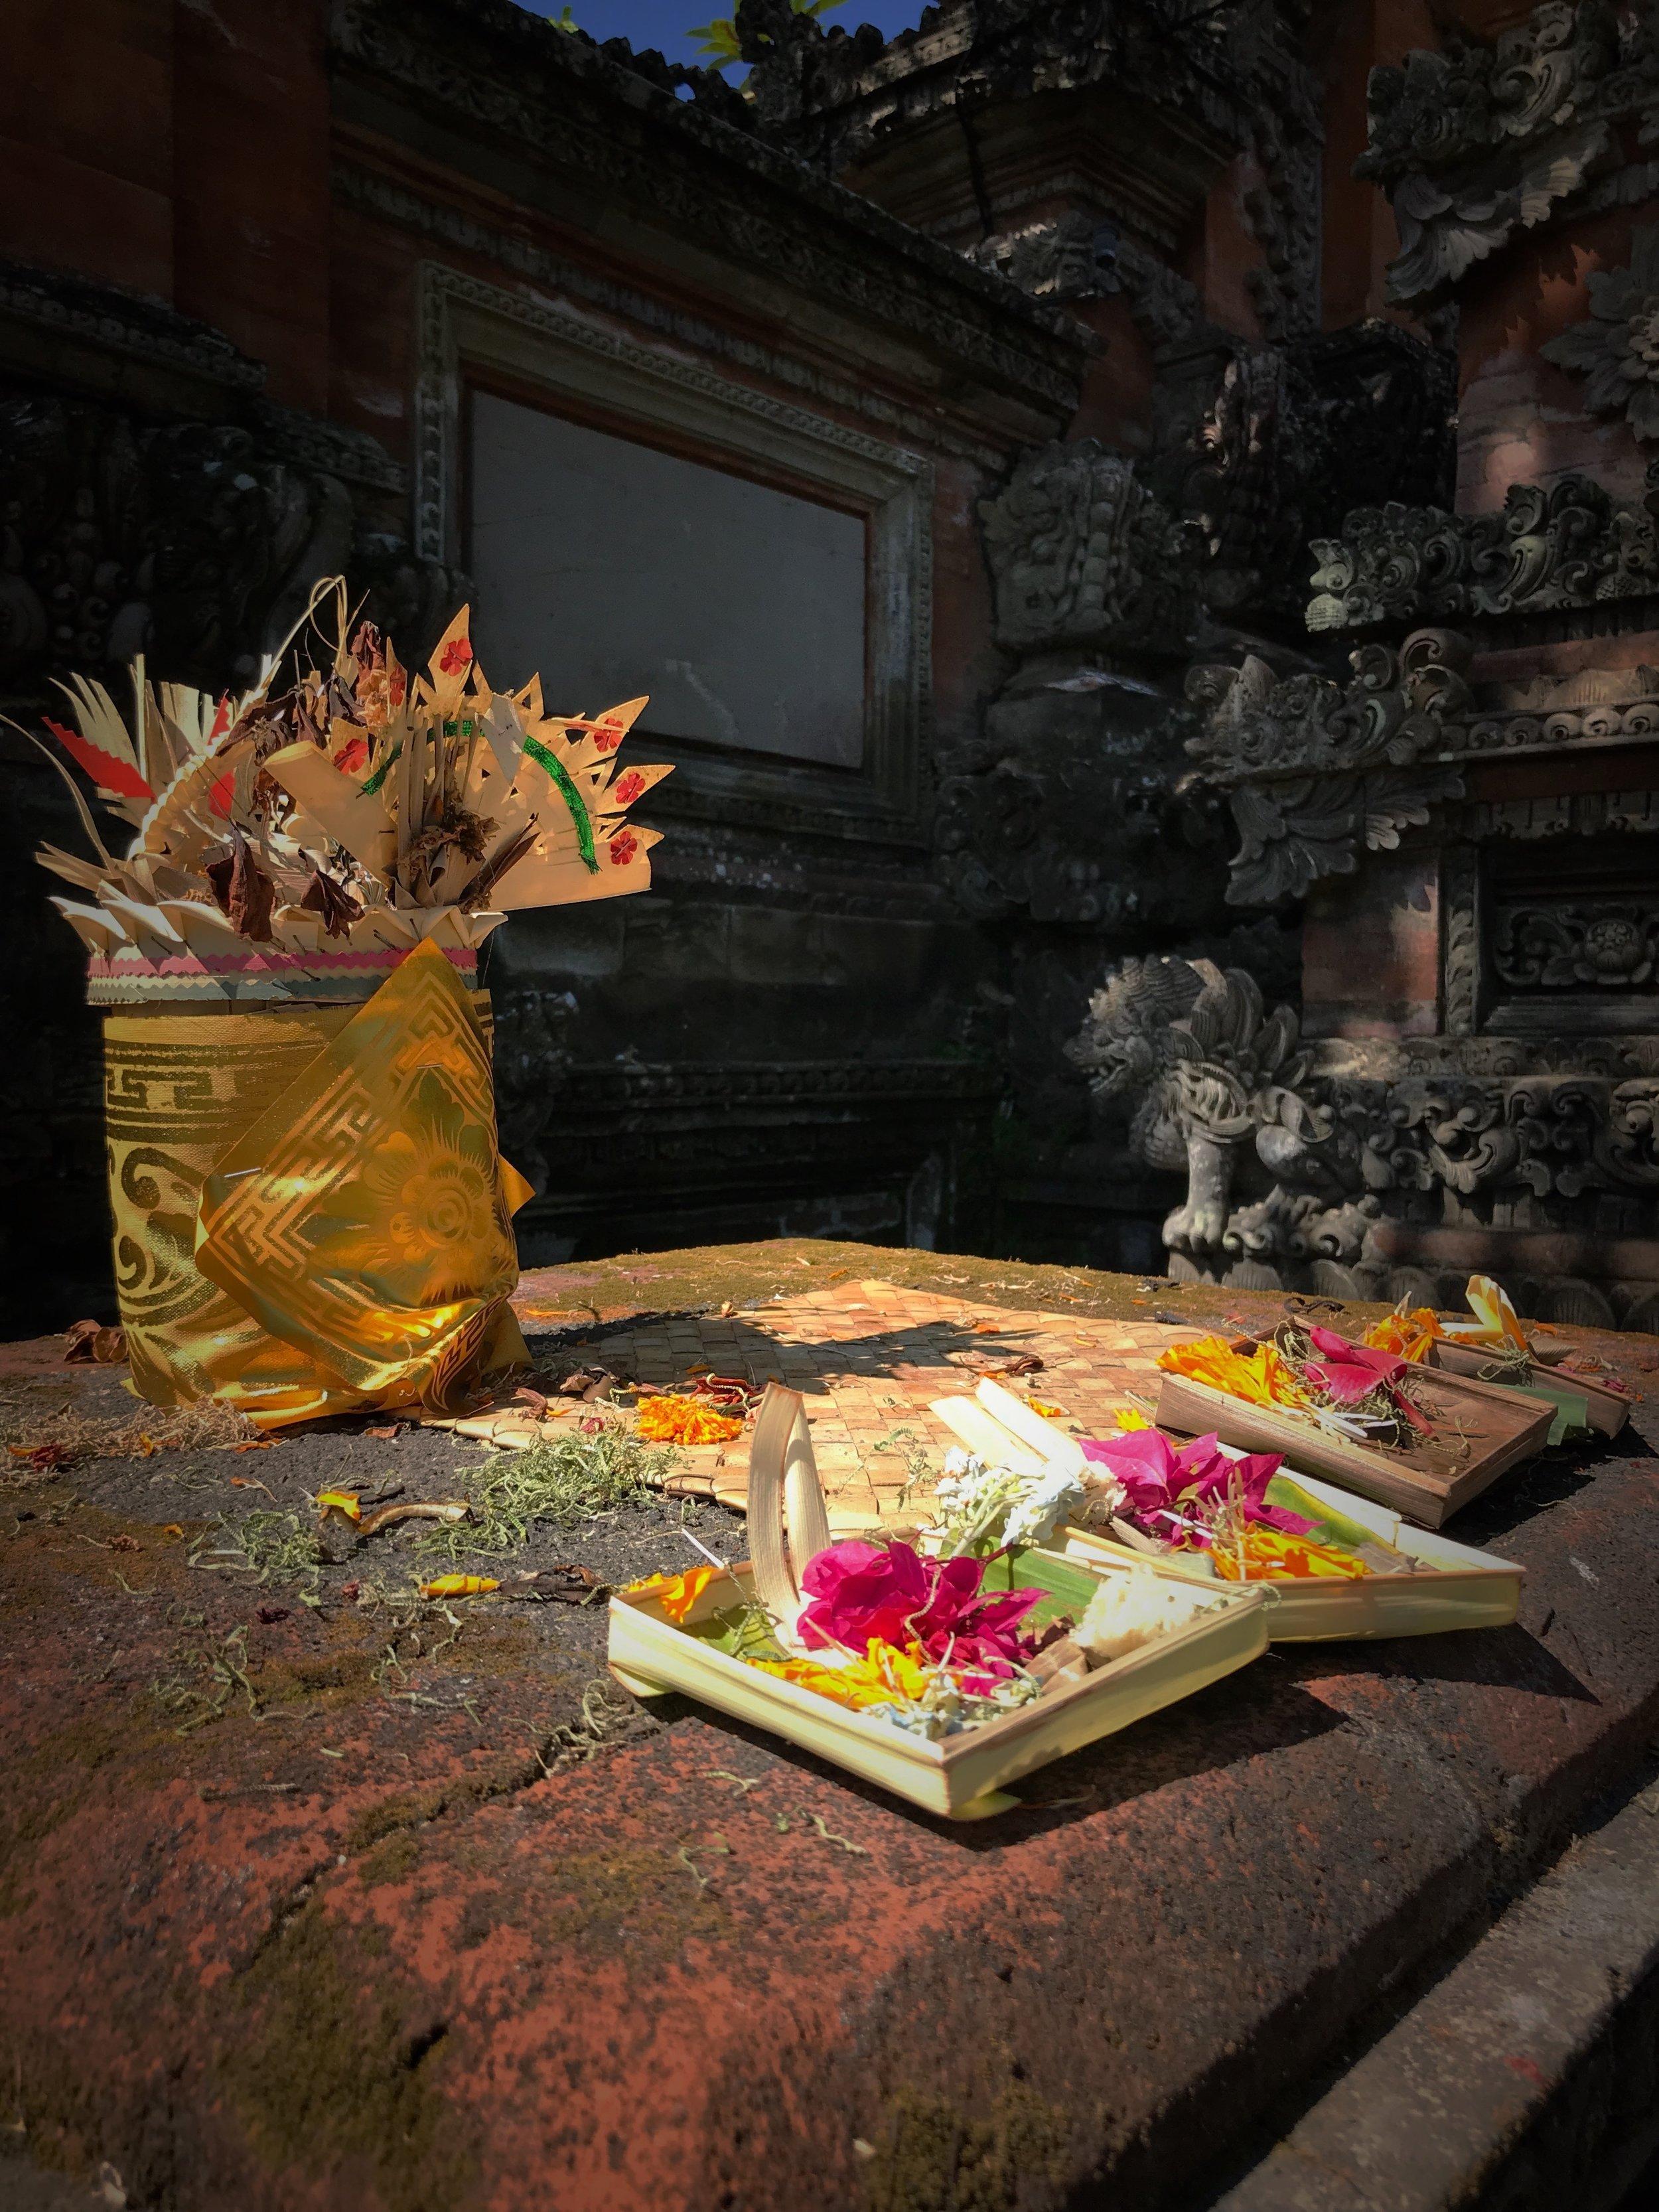 People leave offerings of flowers for Saraswati